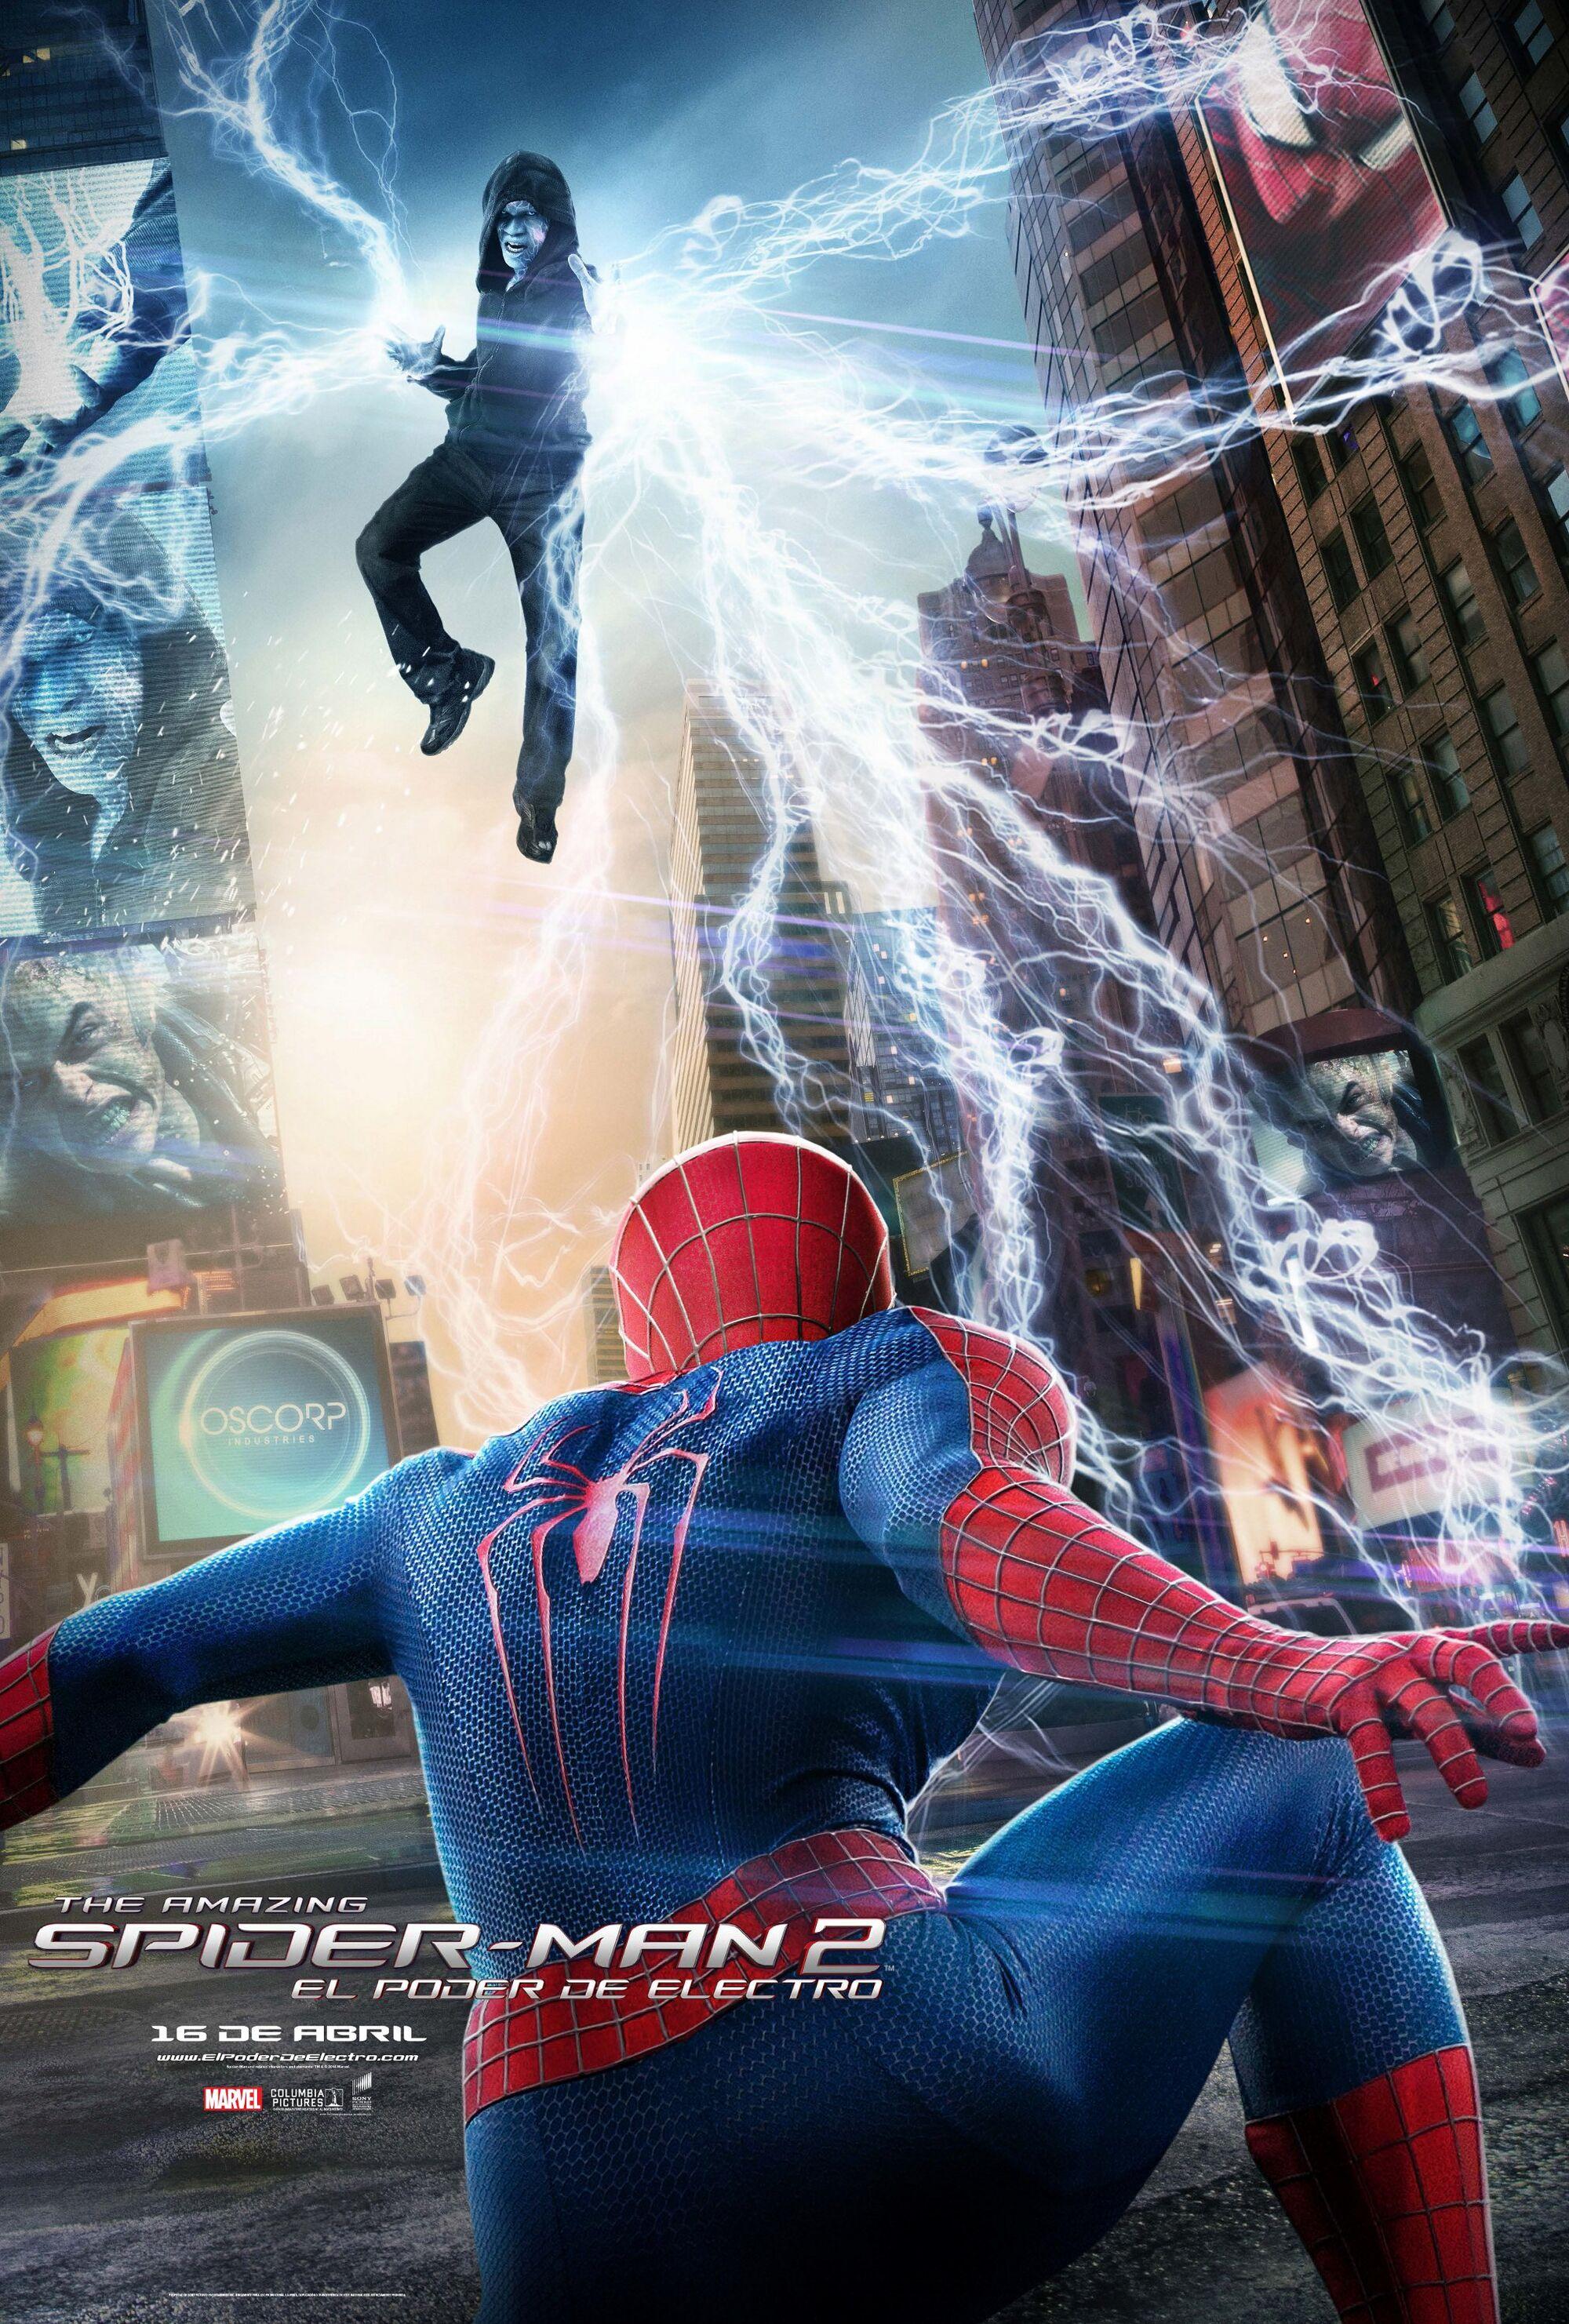 El Sorprendente Hombre Araña 2: El Poder de Electro [2014] [1080p BRrip] [Latino-Inglés] [GoogleDrive]